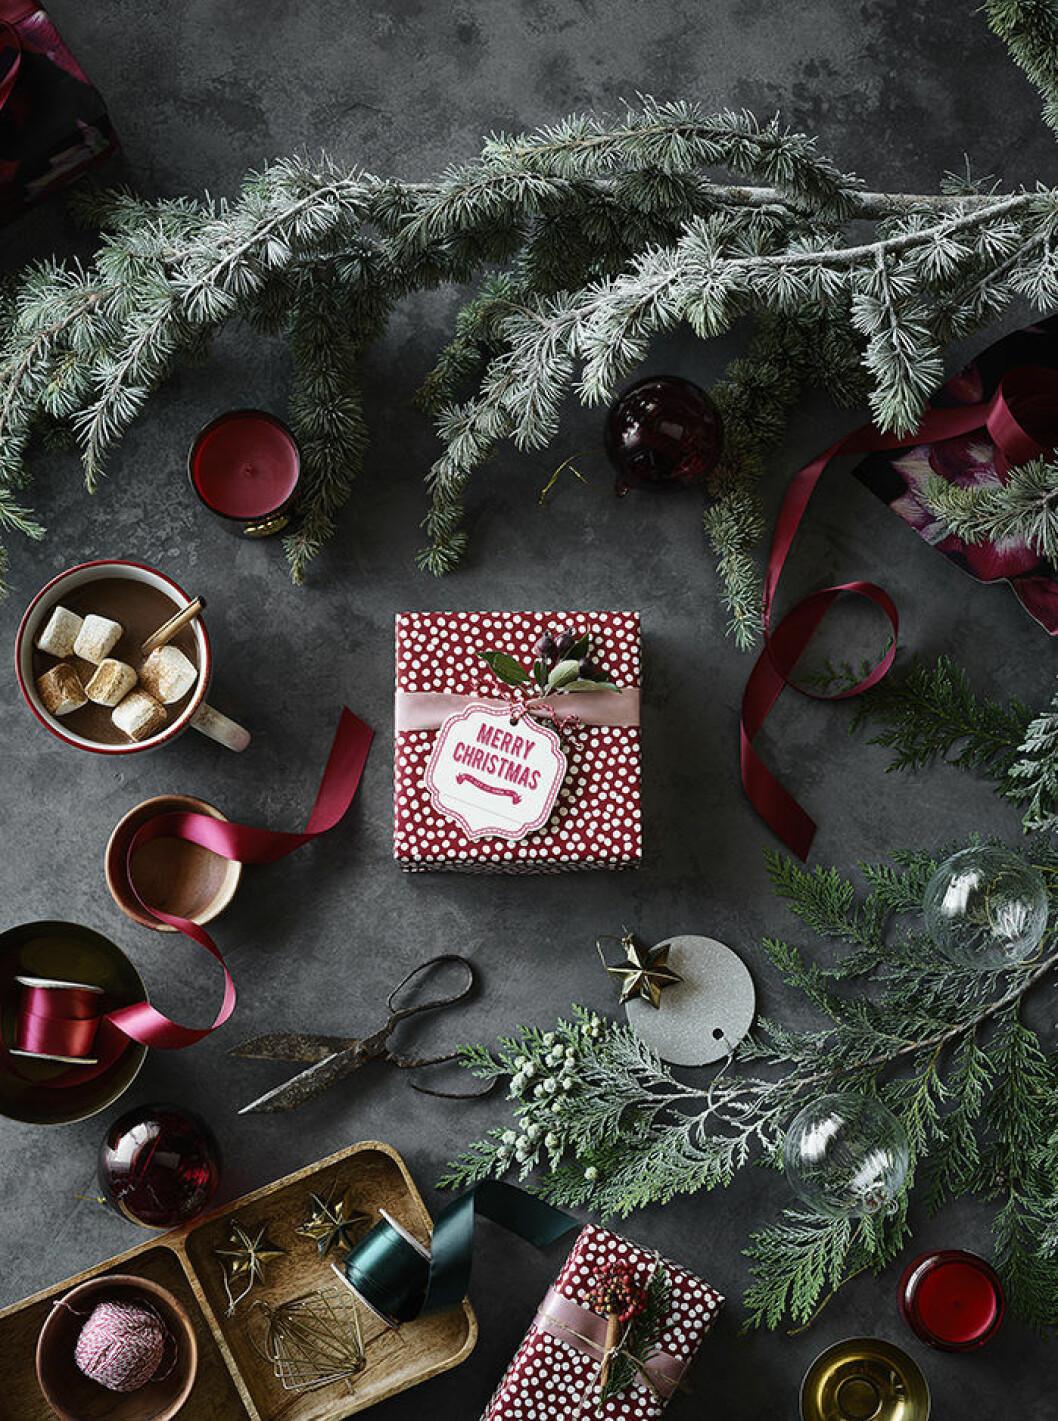 detaljer ur H&M:s julkollektion 2018